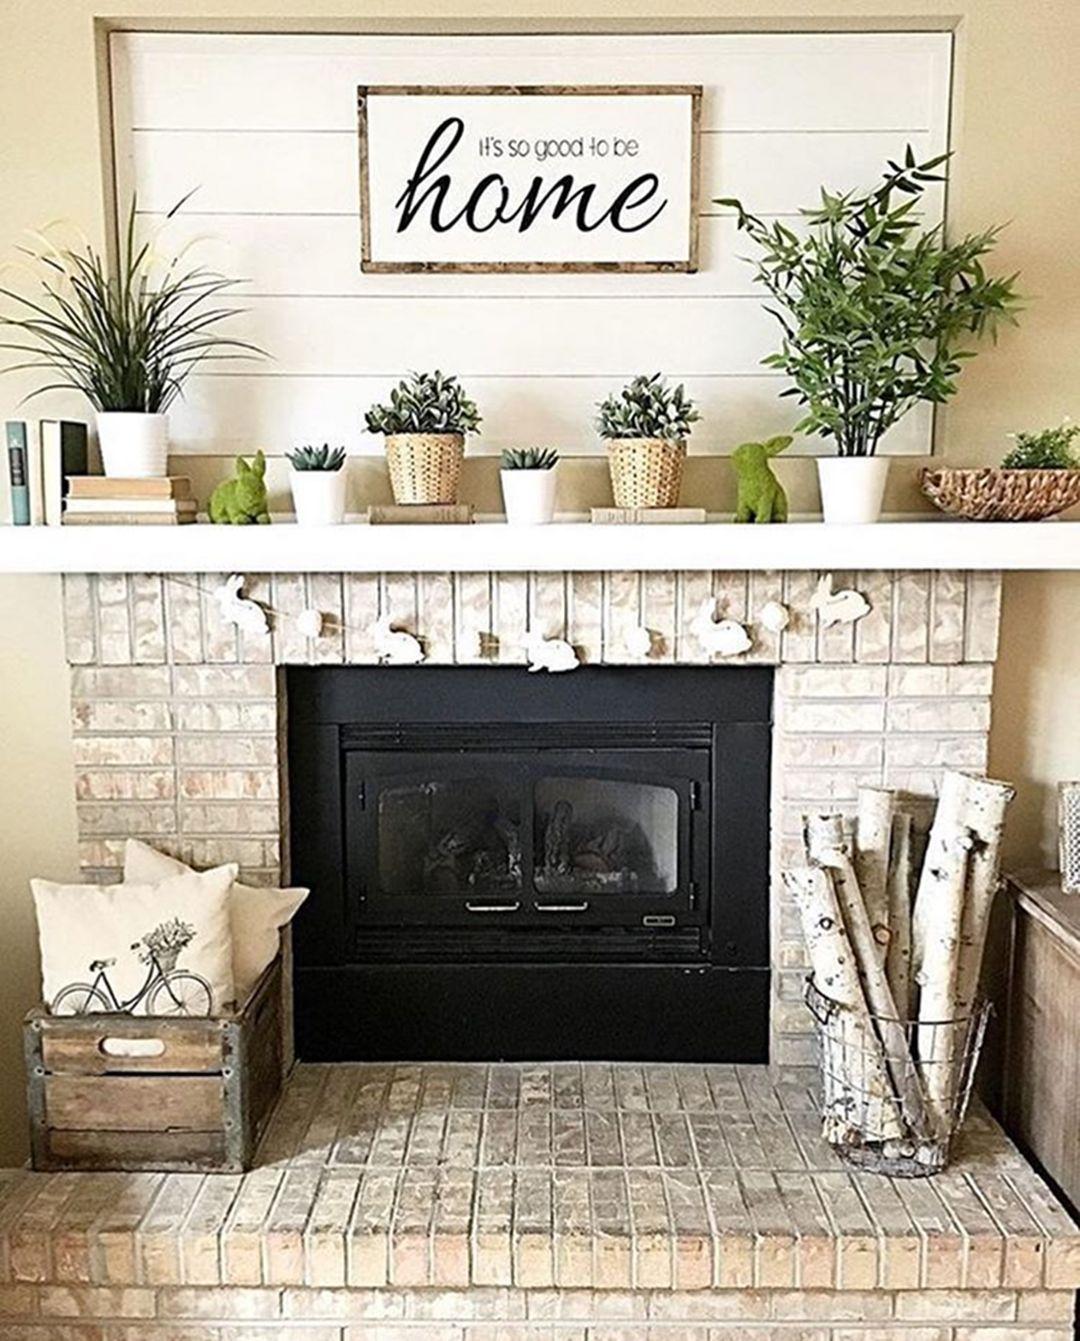 Fireplace Decorating Ideas Photos Inspirational Farmhouse Fireplace Mantel Decor Decor It S